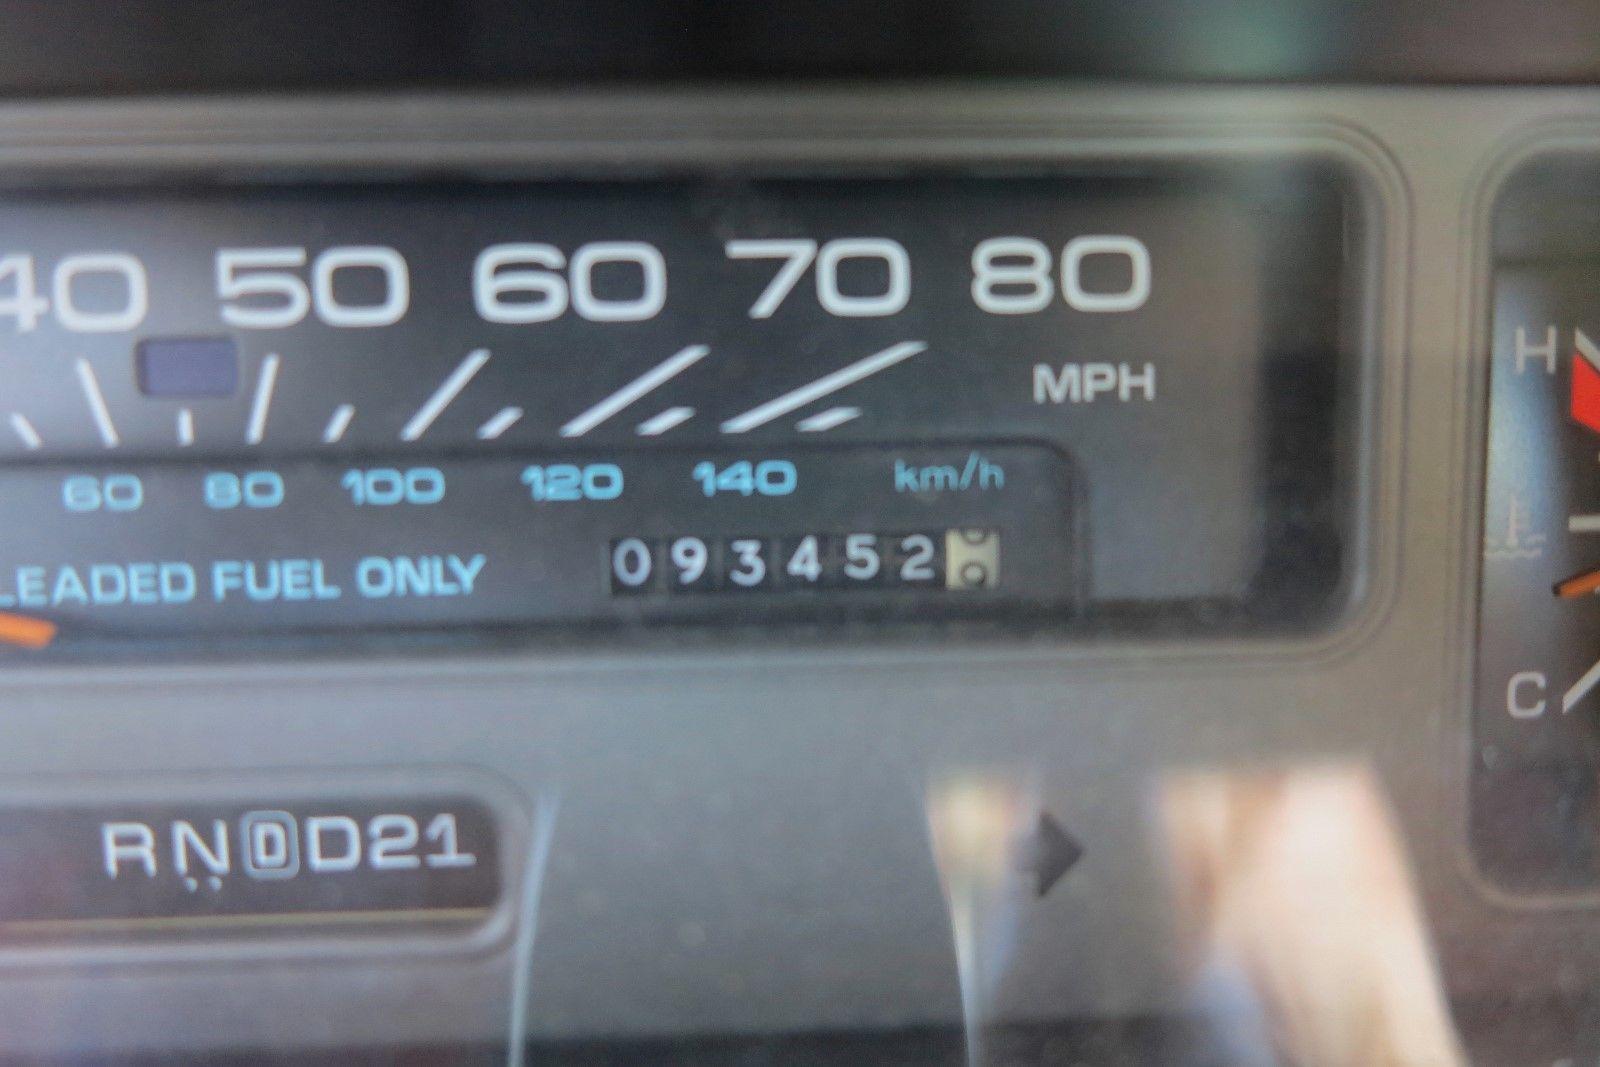 1991 Chevrolet Caprice Classic Wagon odometer